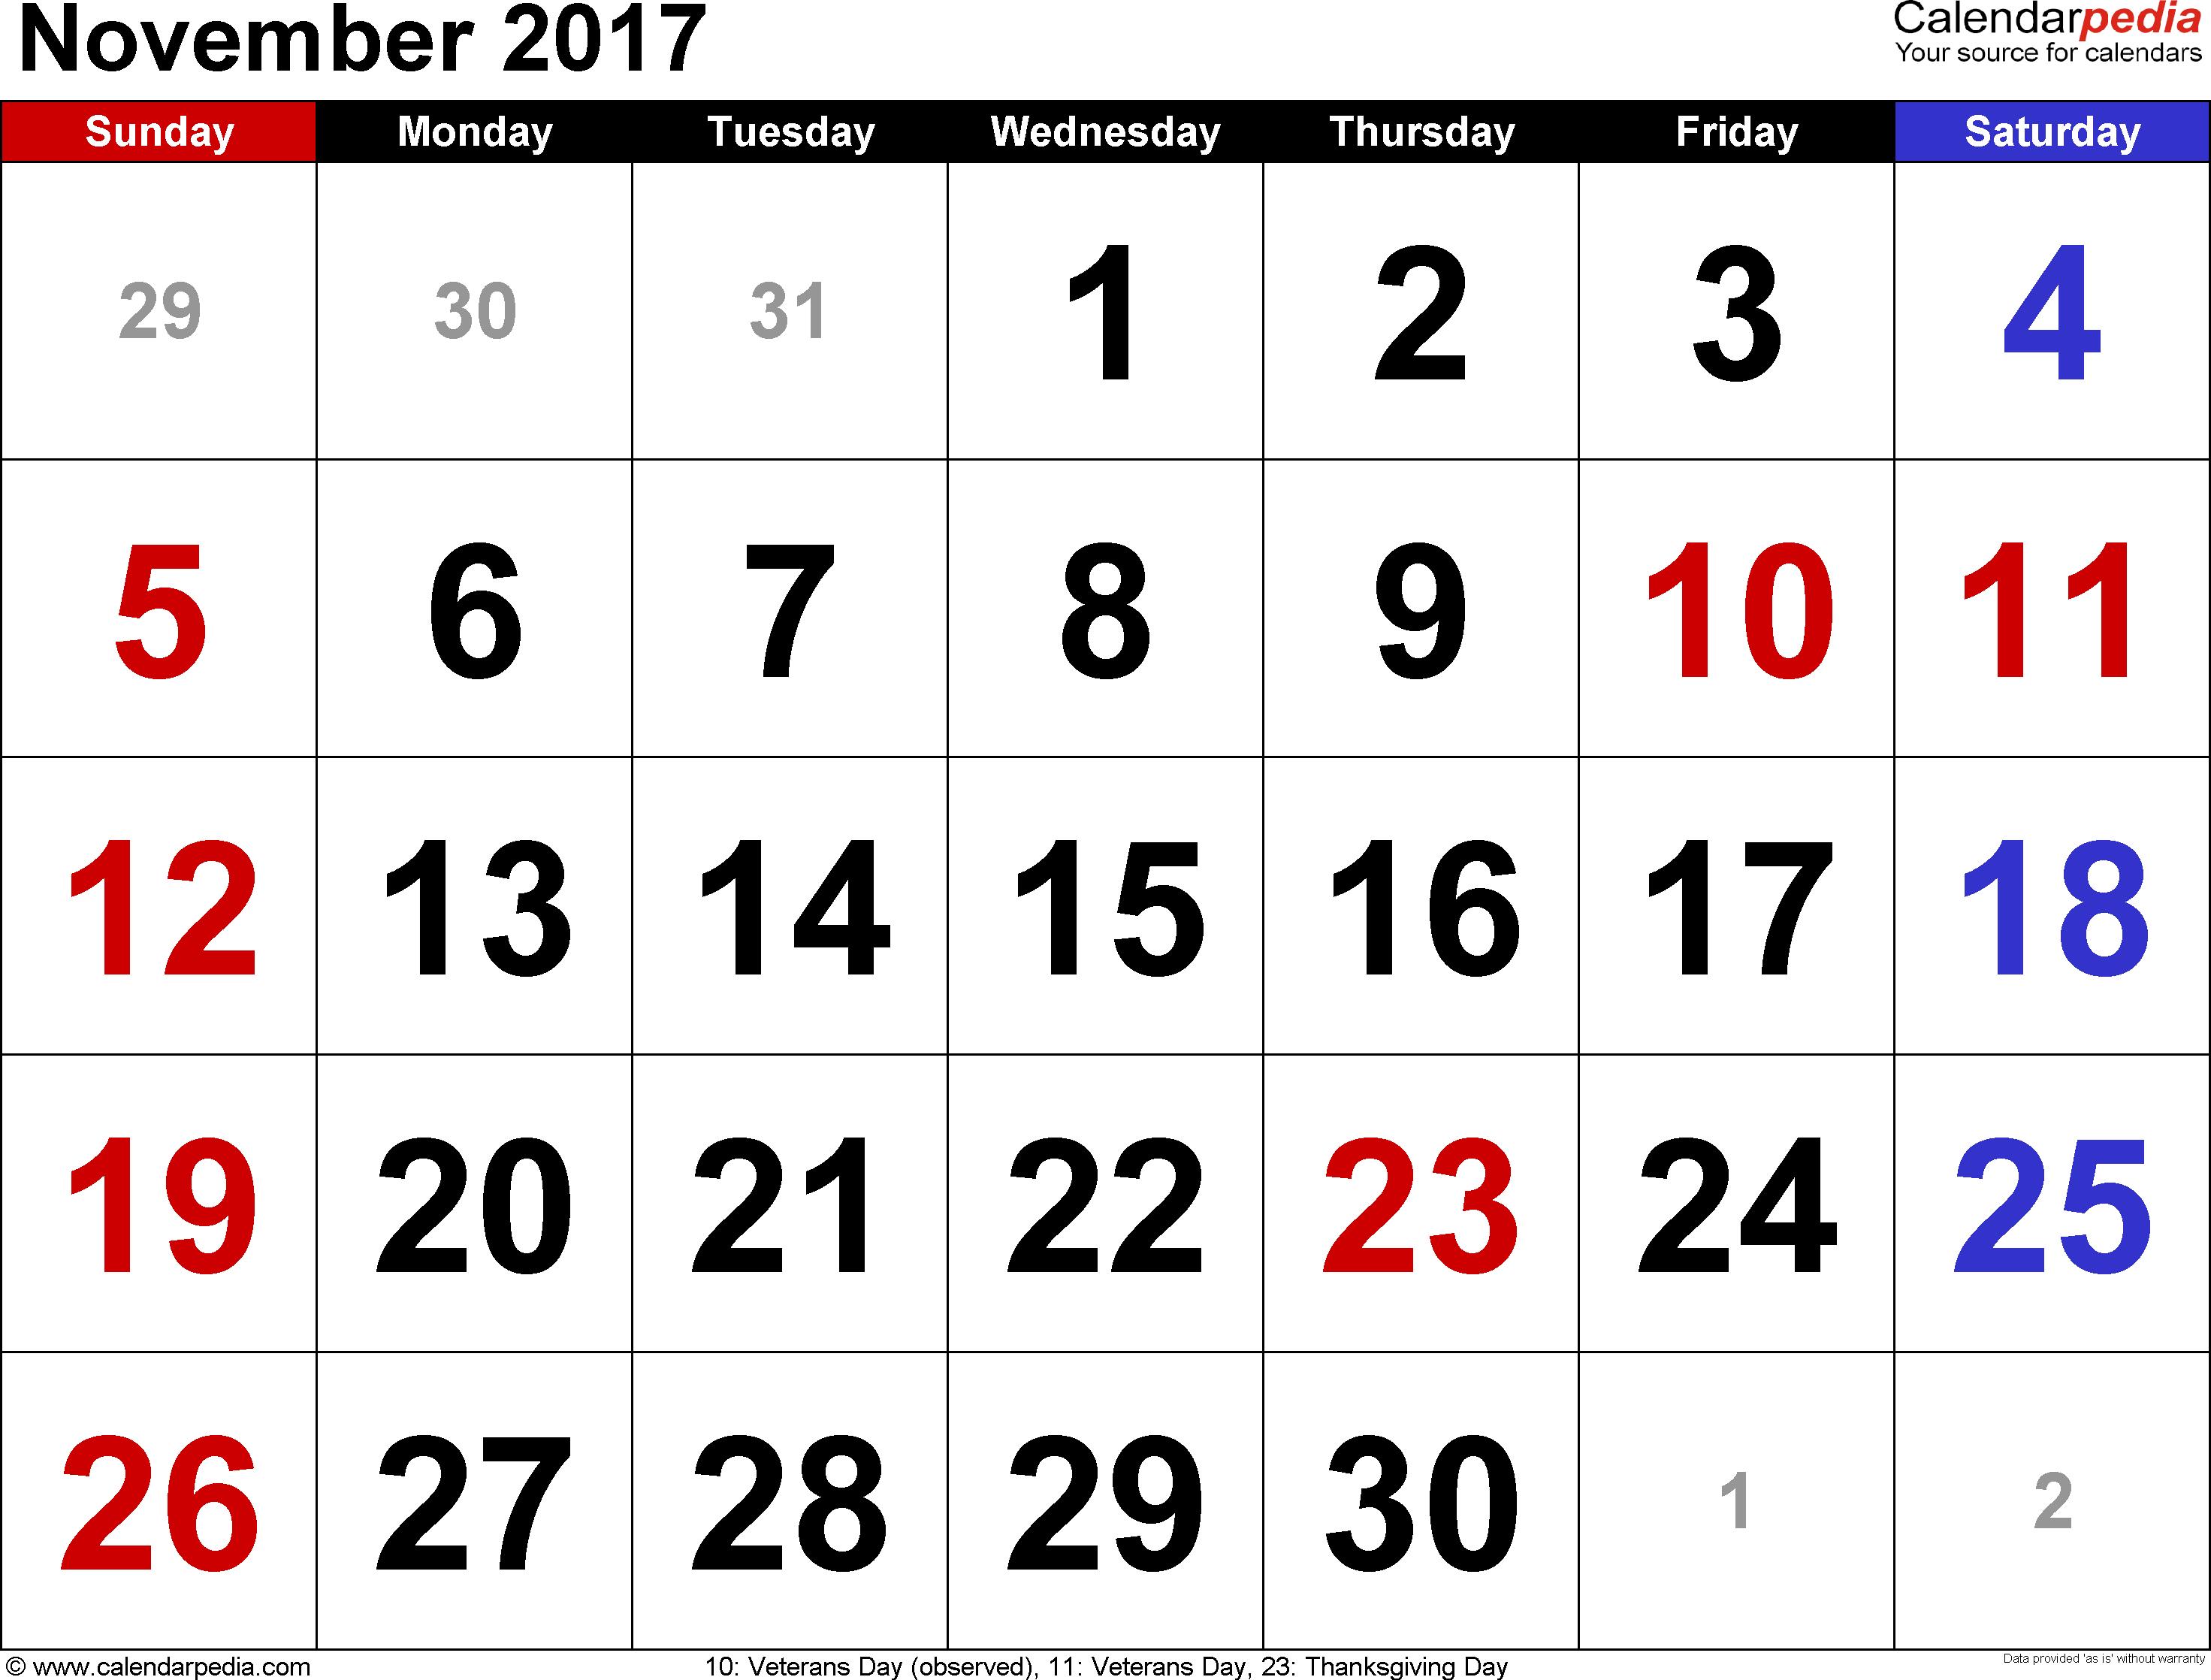 November 2017 Calendars for Word, Excel & PDF